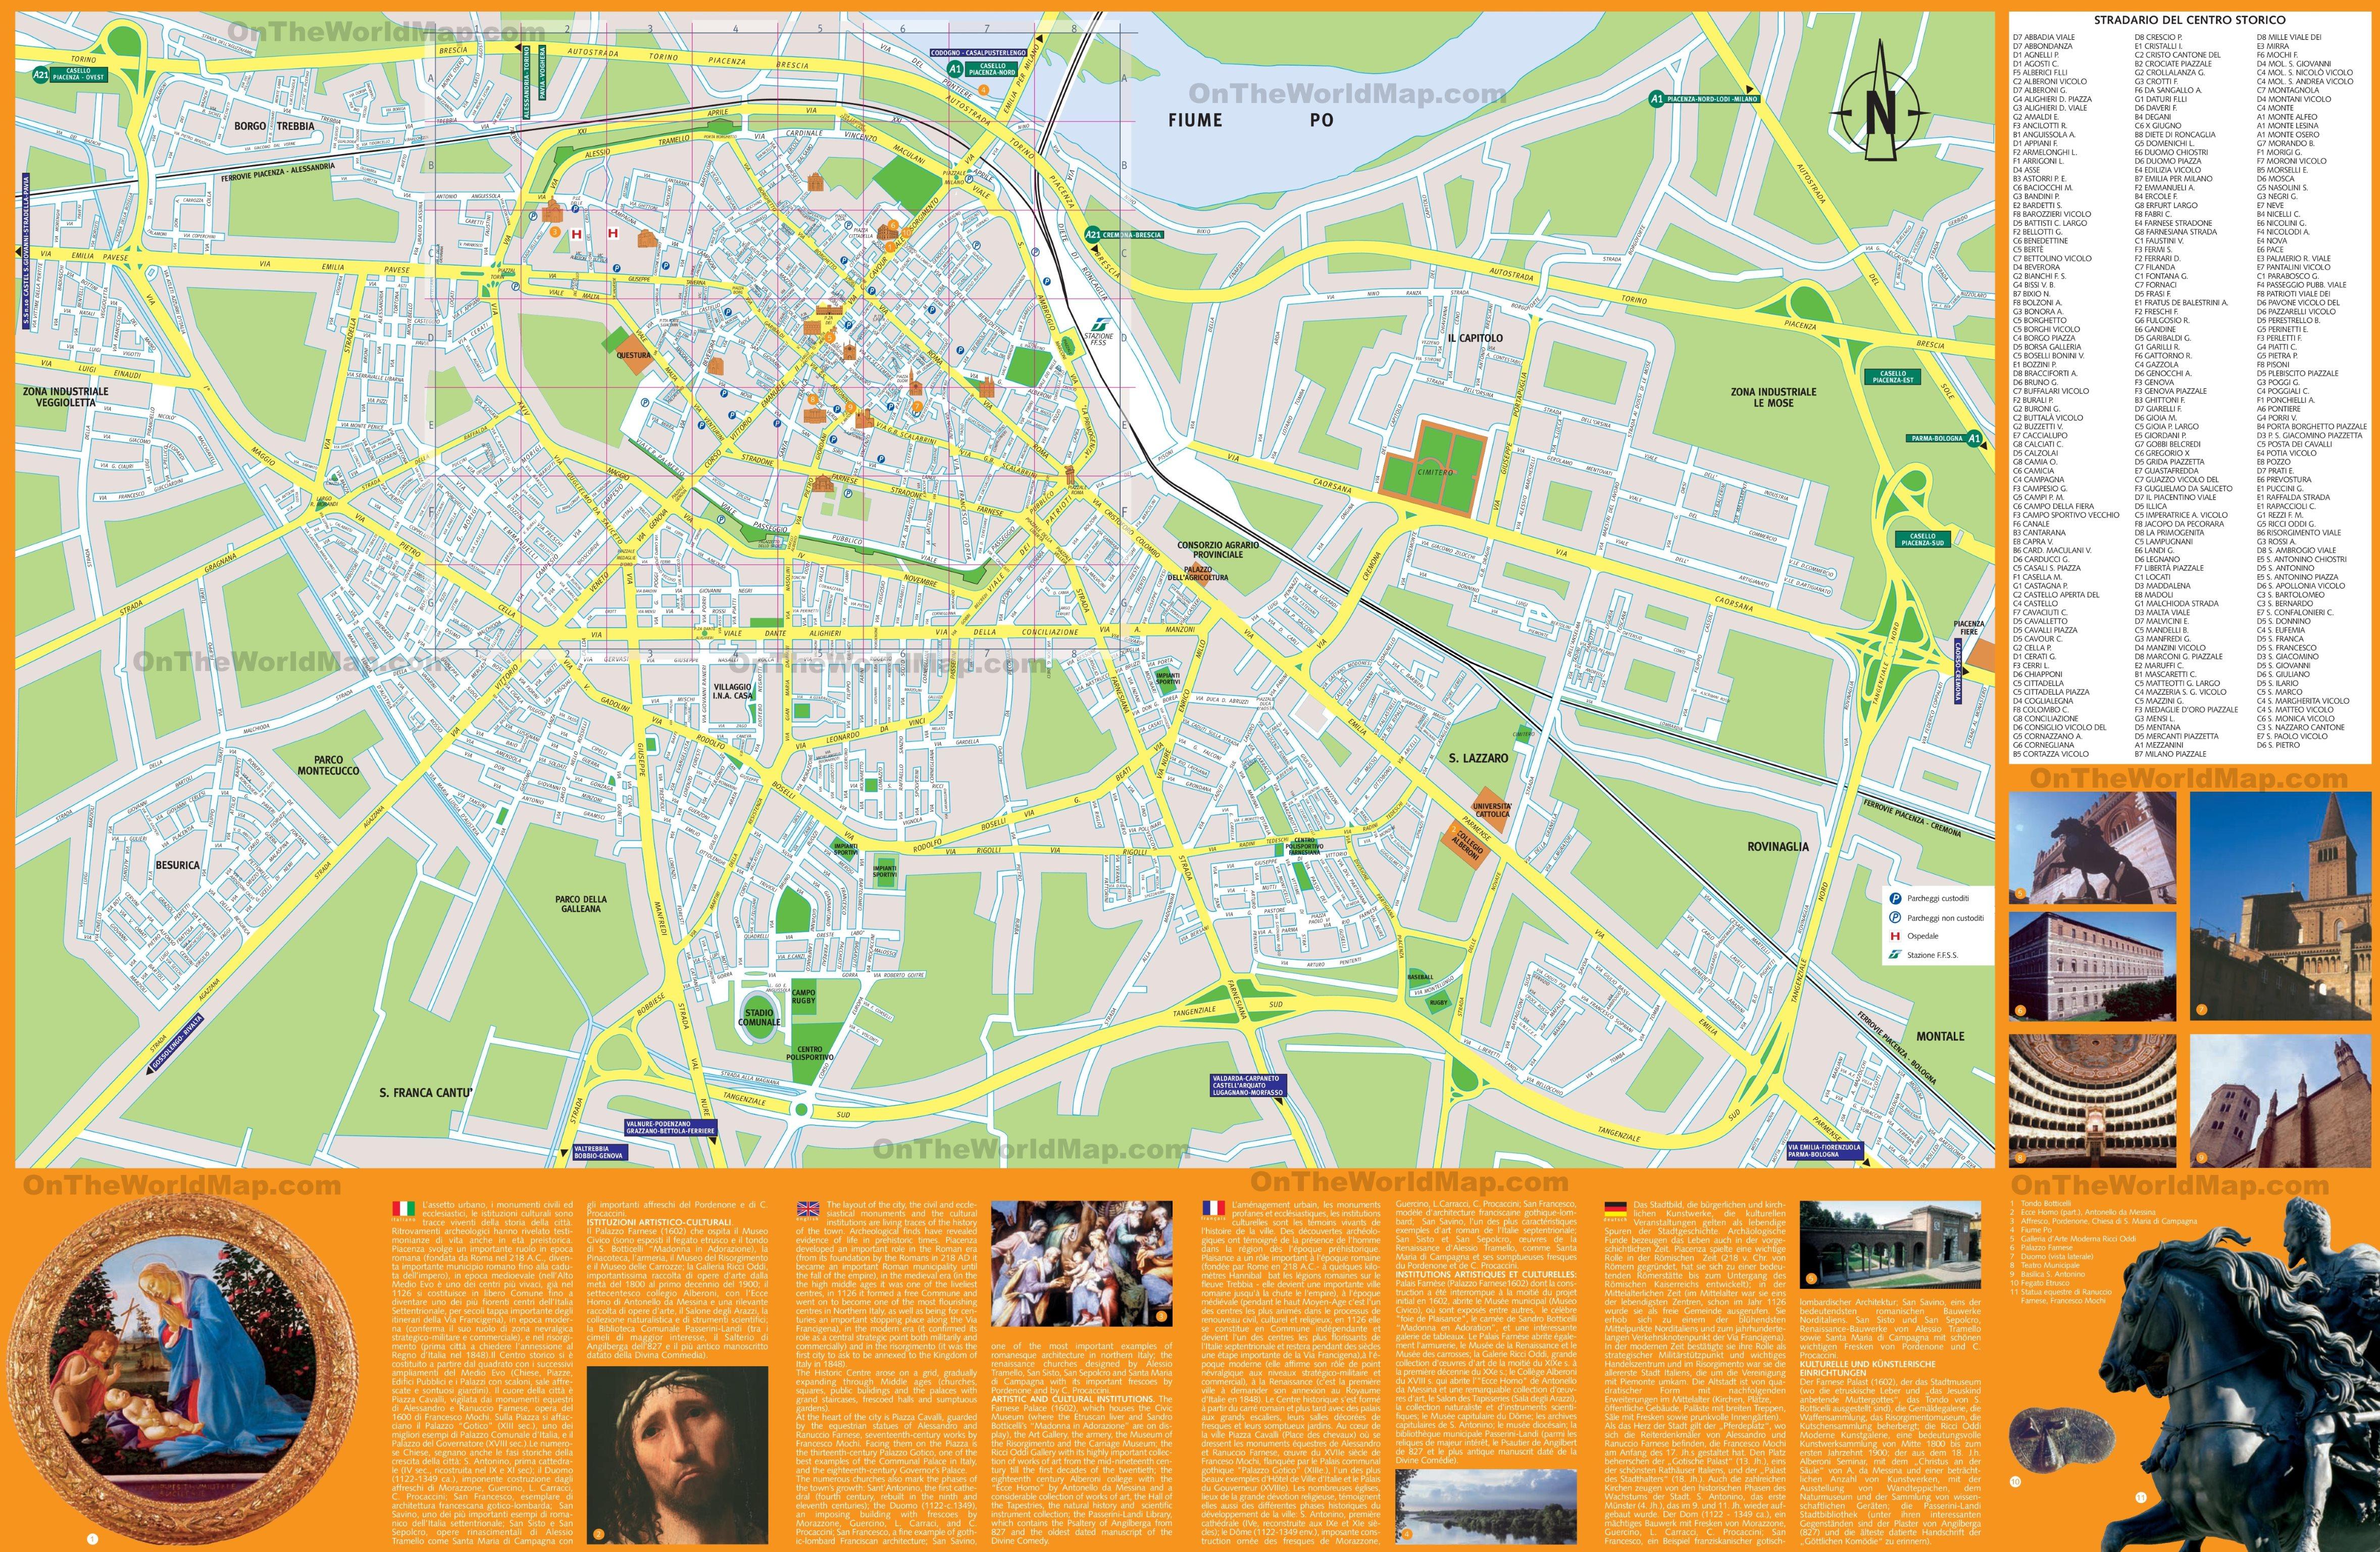 Piacenza sightseeing map